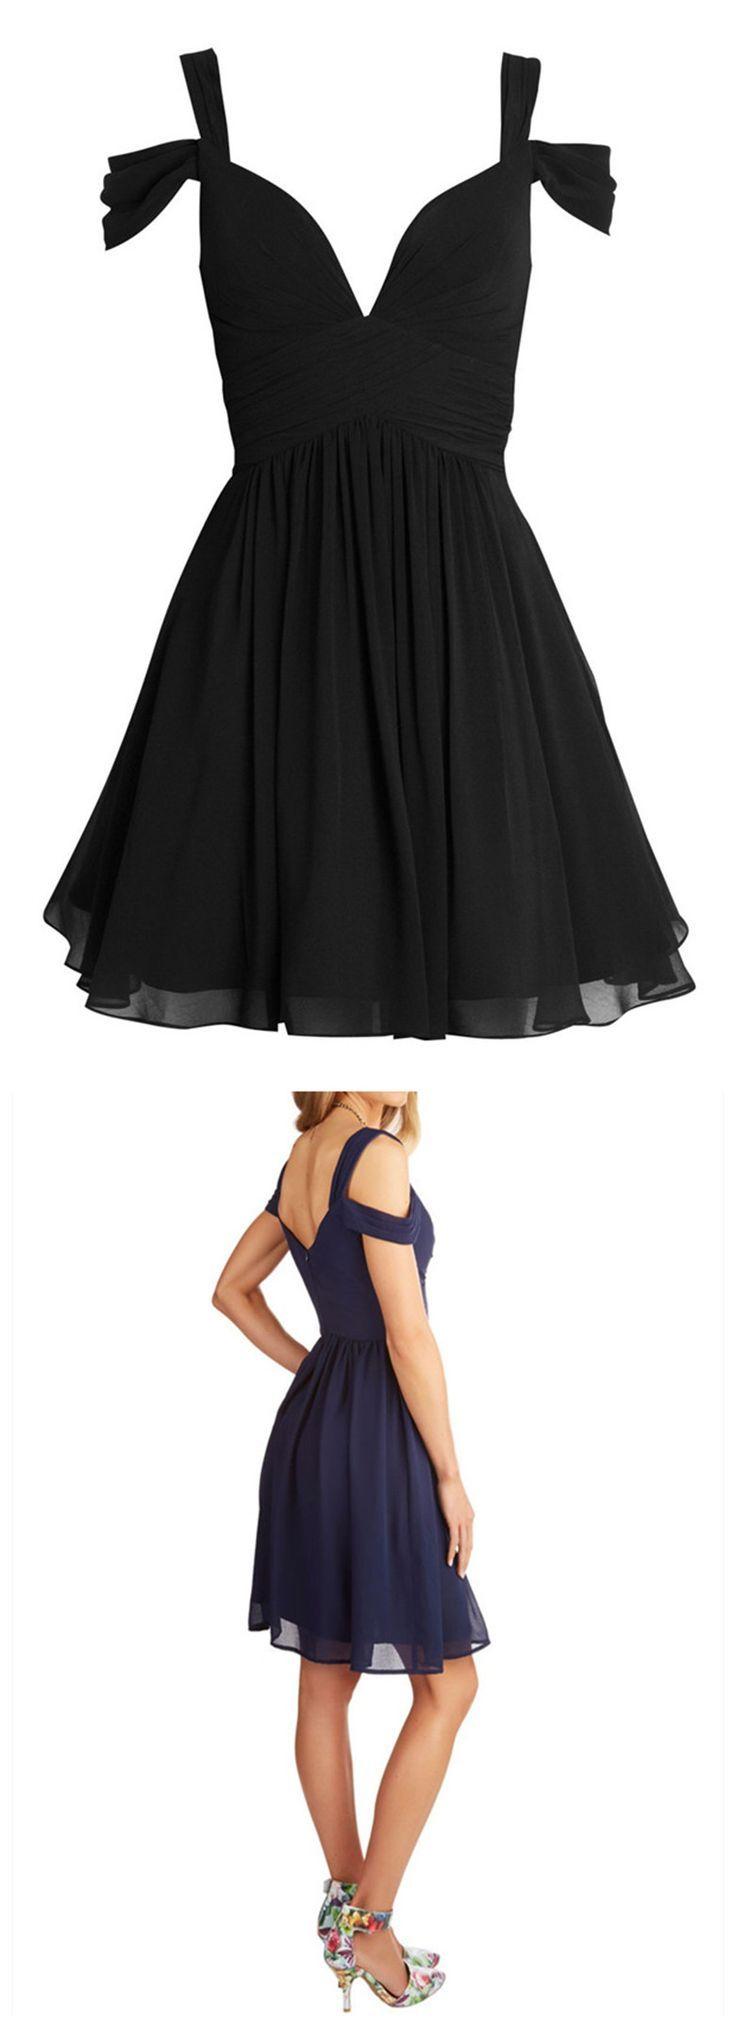 2016 homecoming dress,black homecoming dress,short prom ...